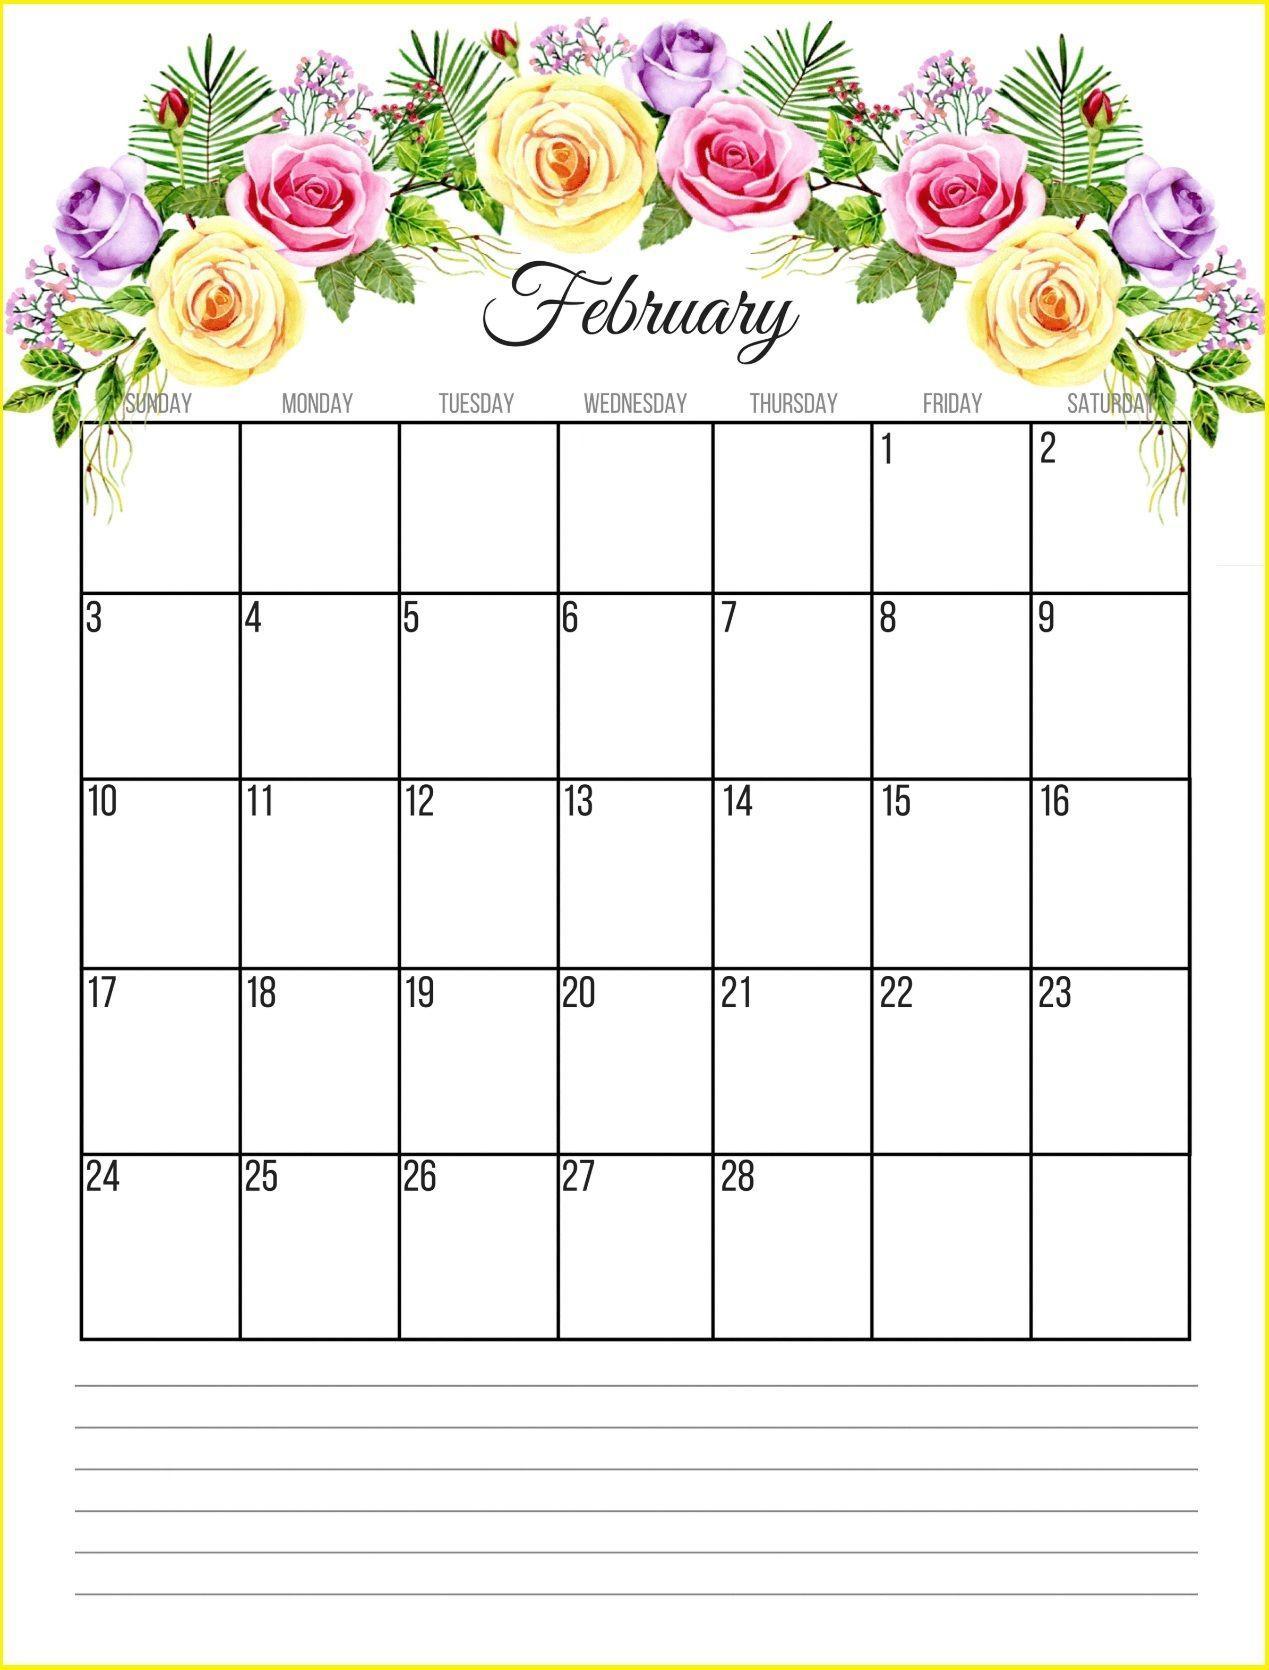 Calendar February 2019 Design February 2019 Calendar Wallpapers   Wallpaper Cave